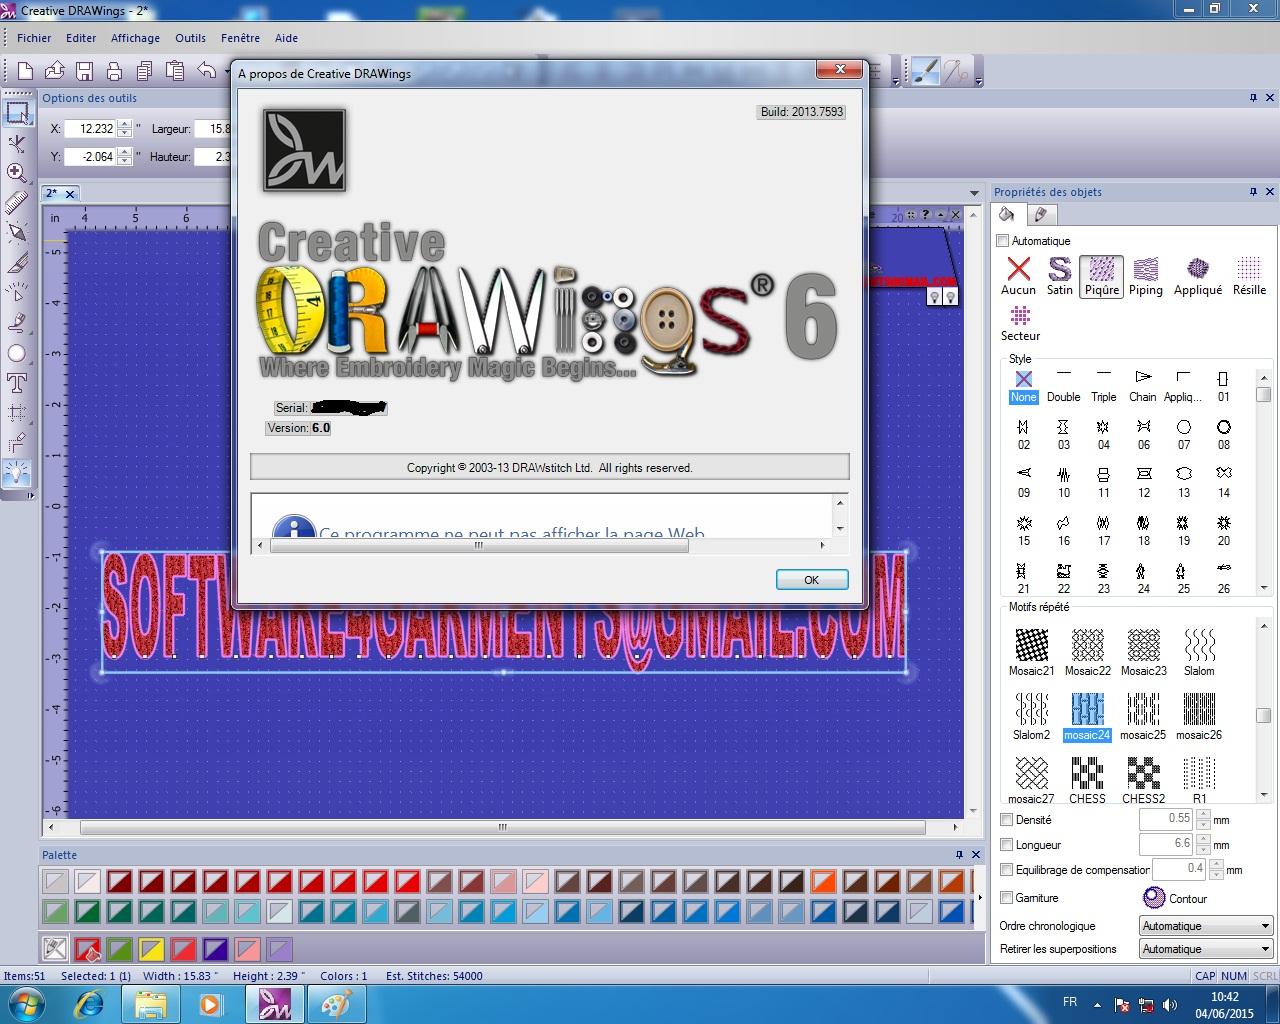 lectra modaris v7r2 crack free download